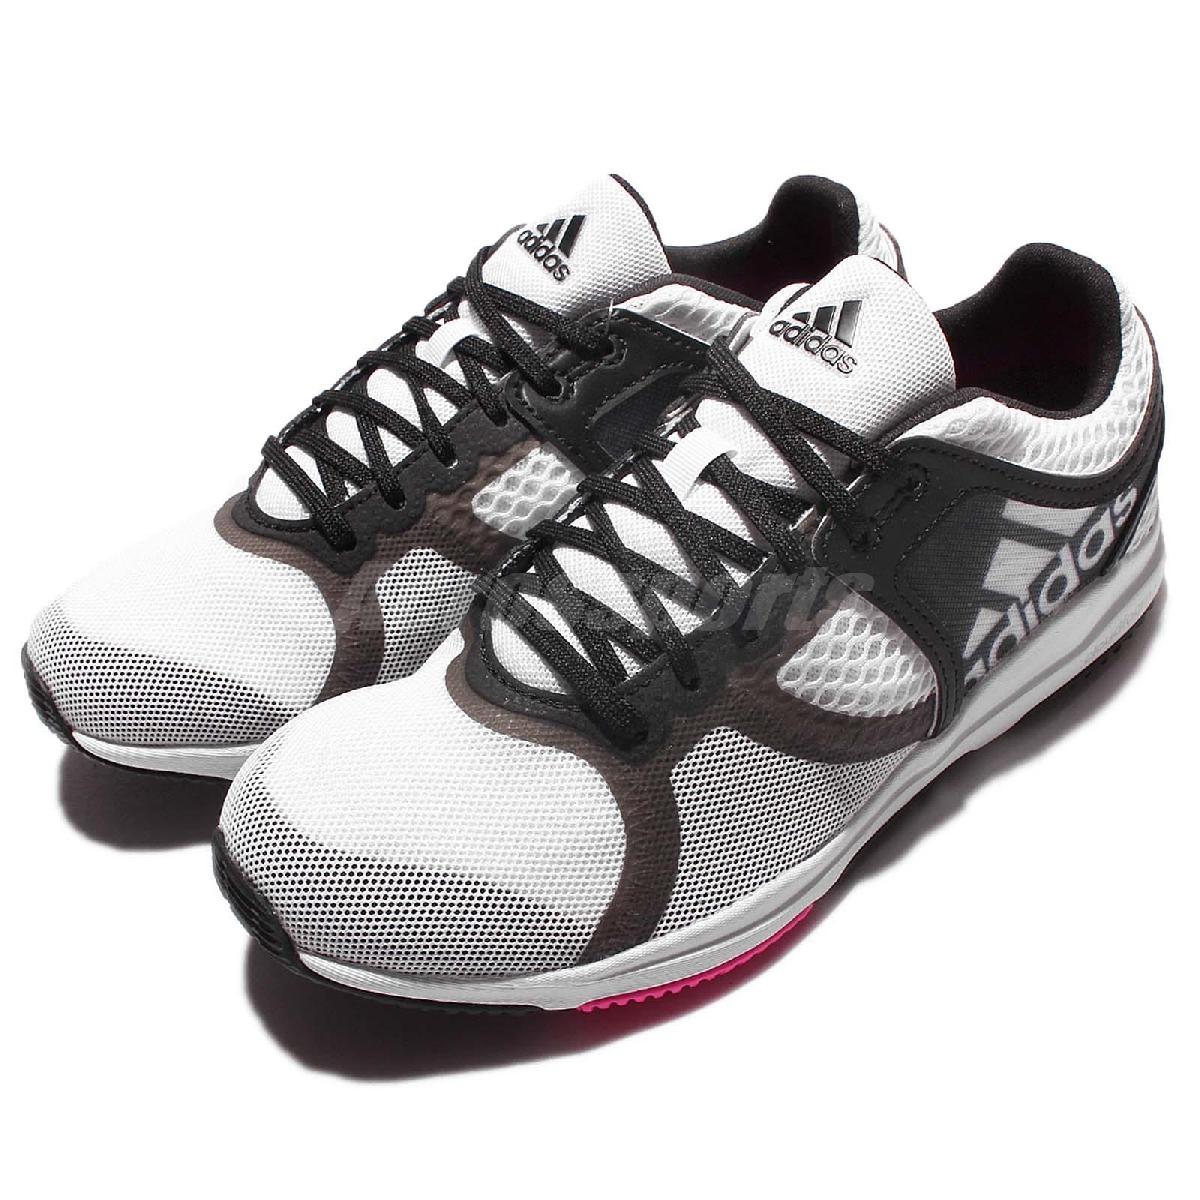 adidas 訓練鞋 Crazymove CF W 白黑 桃紅 白 黑 透氣穩定 運動鞋 女鞋【PUMP306】 AQ2638